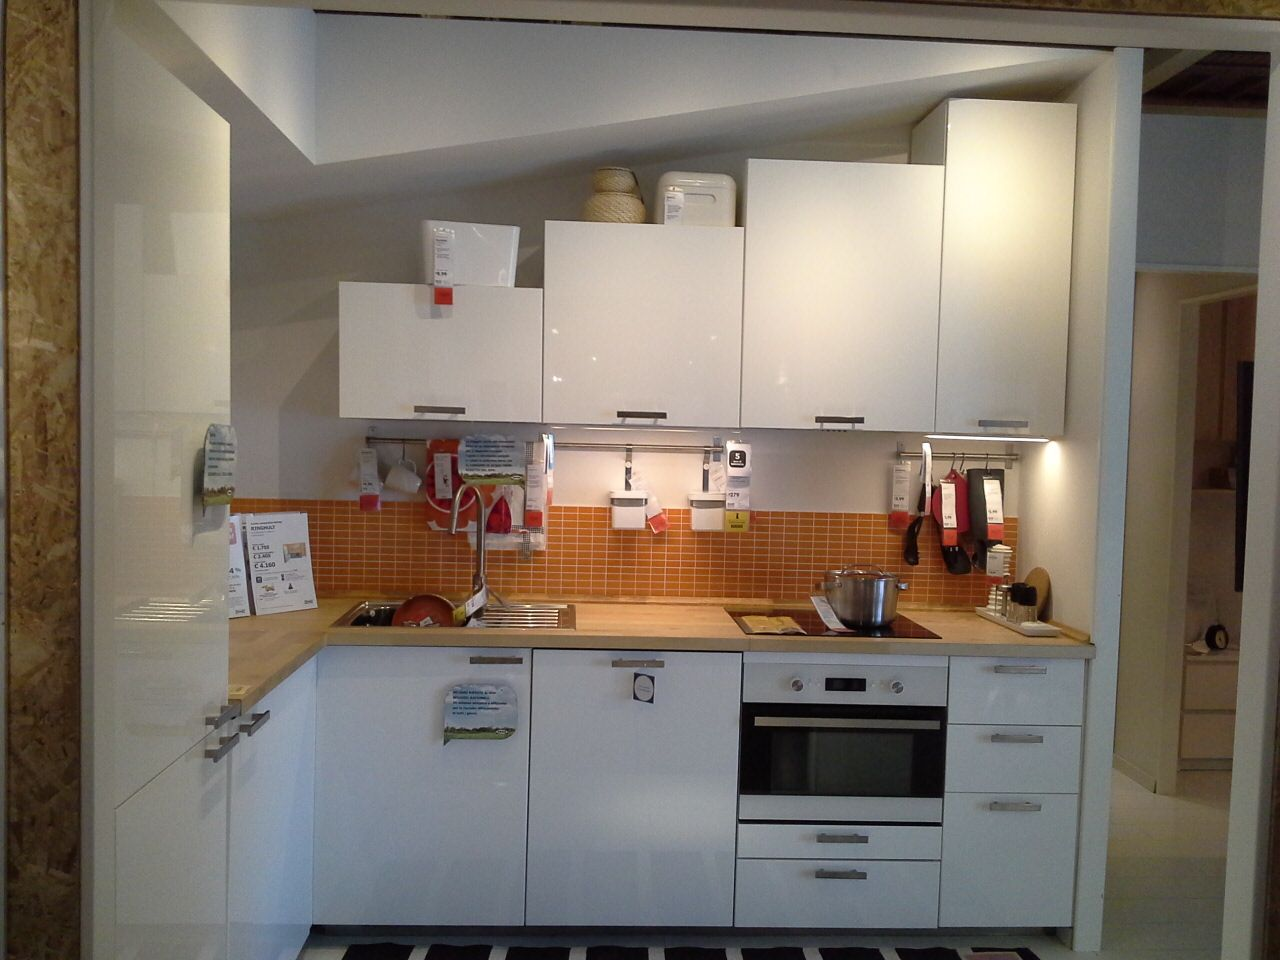 Asselle mobili cucine cucine componibili in acciaio inox for Asselle arredamenti